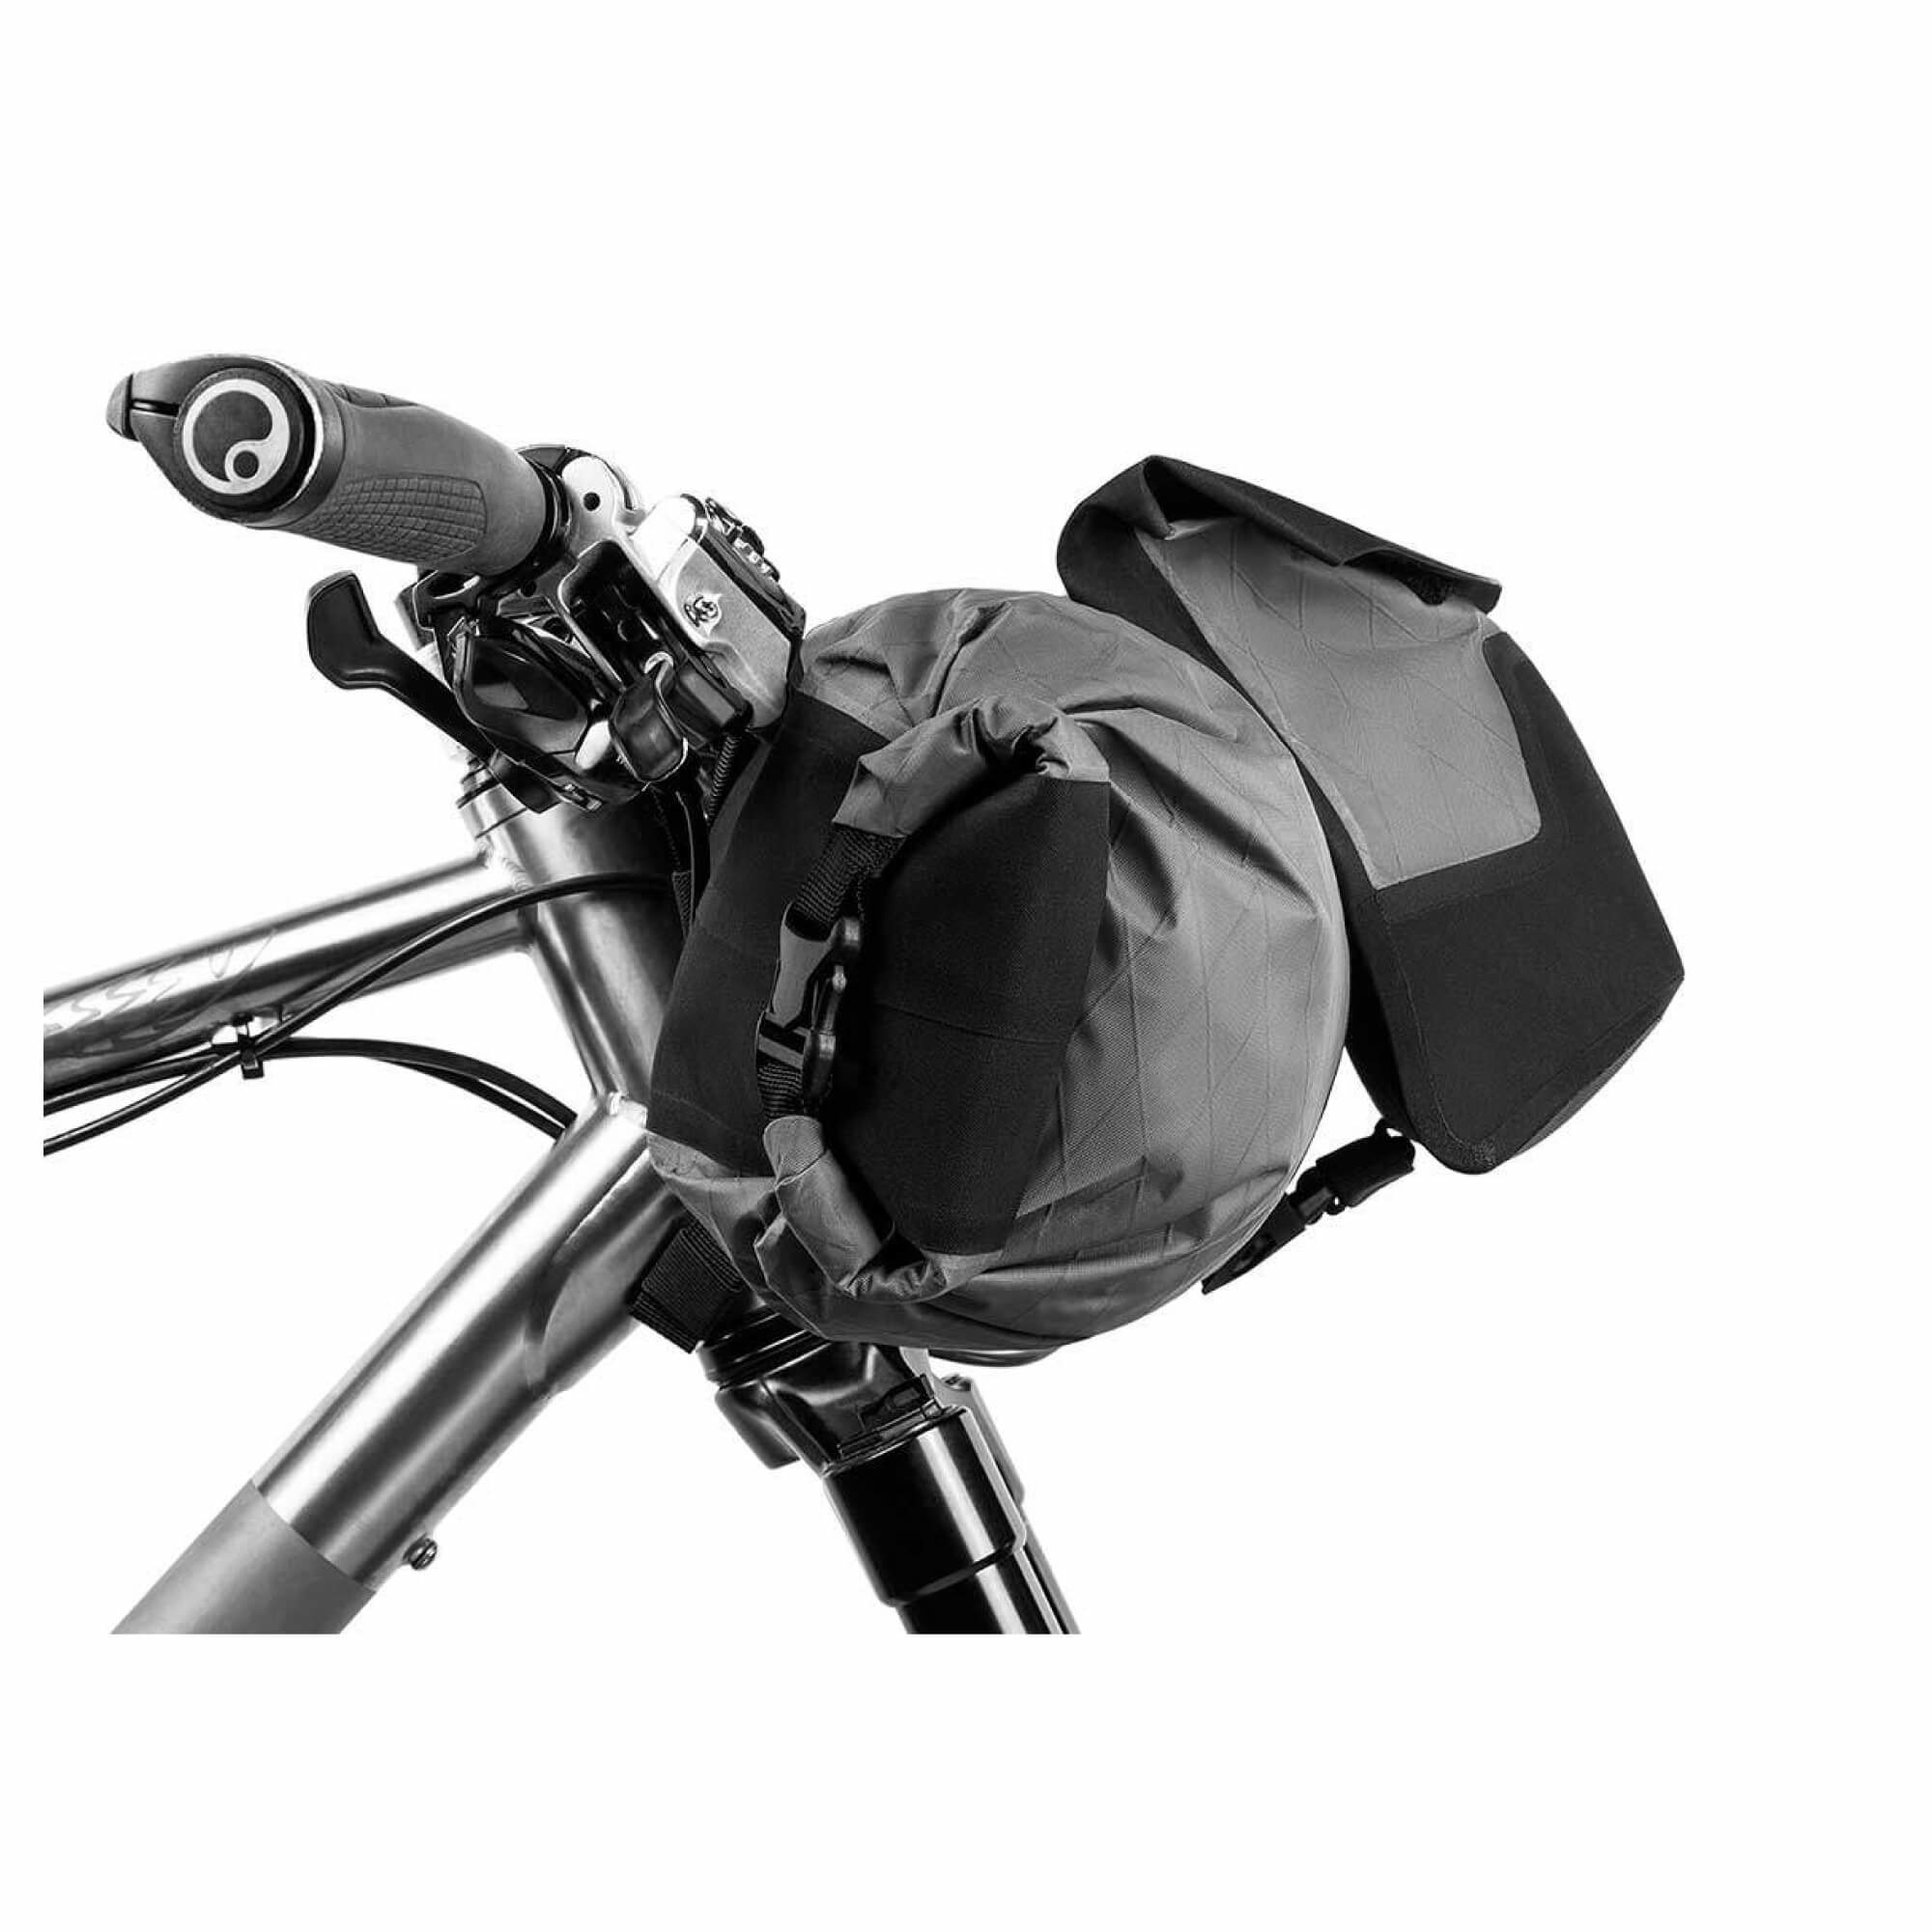 Backcountry2 Accesory Pocket 4 L-7